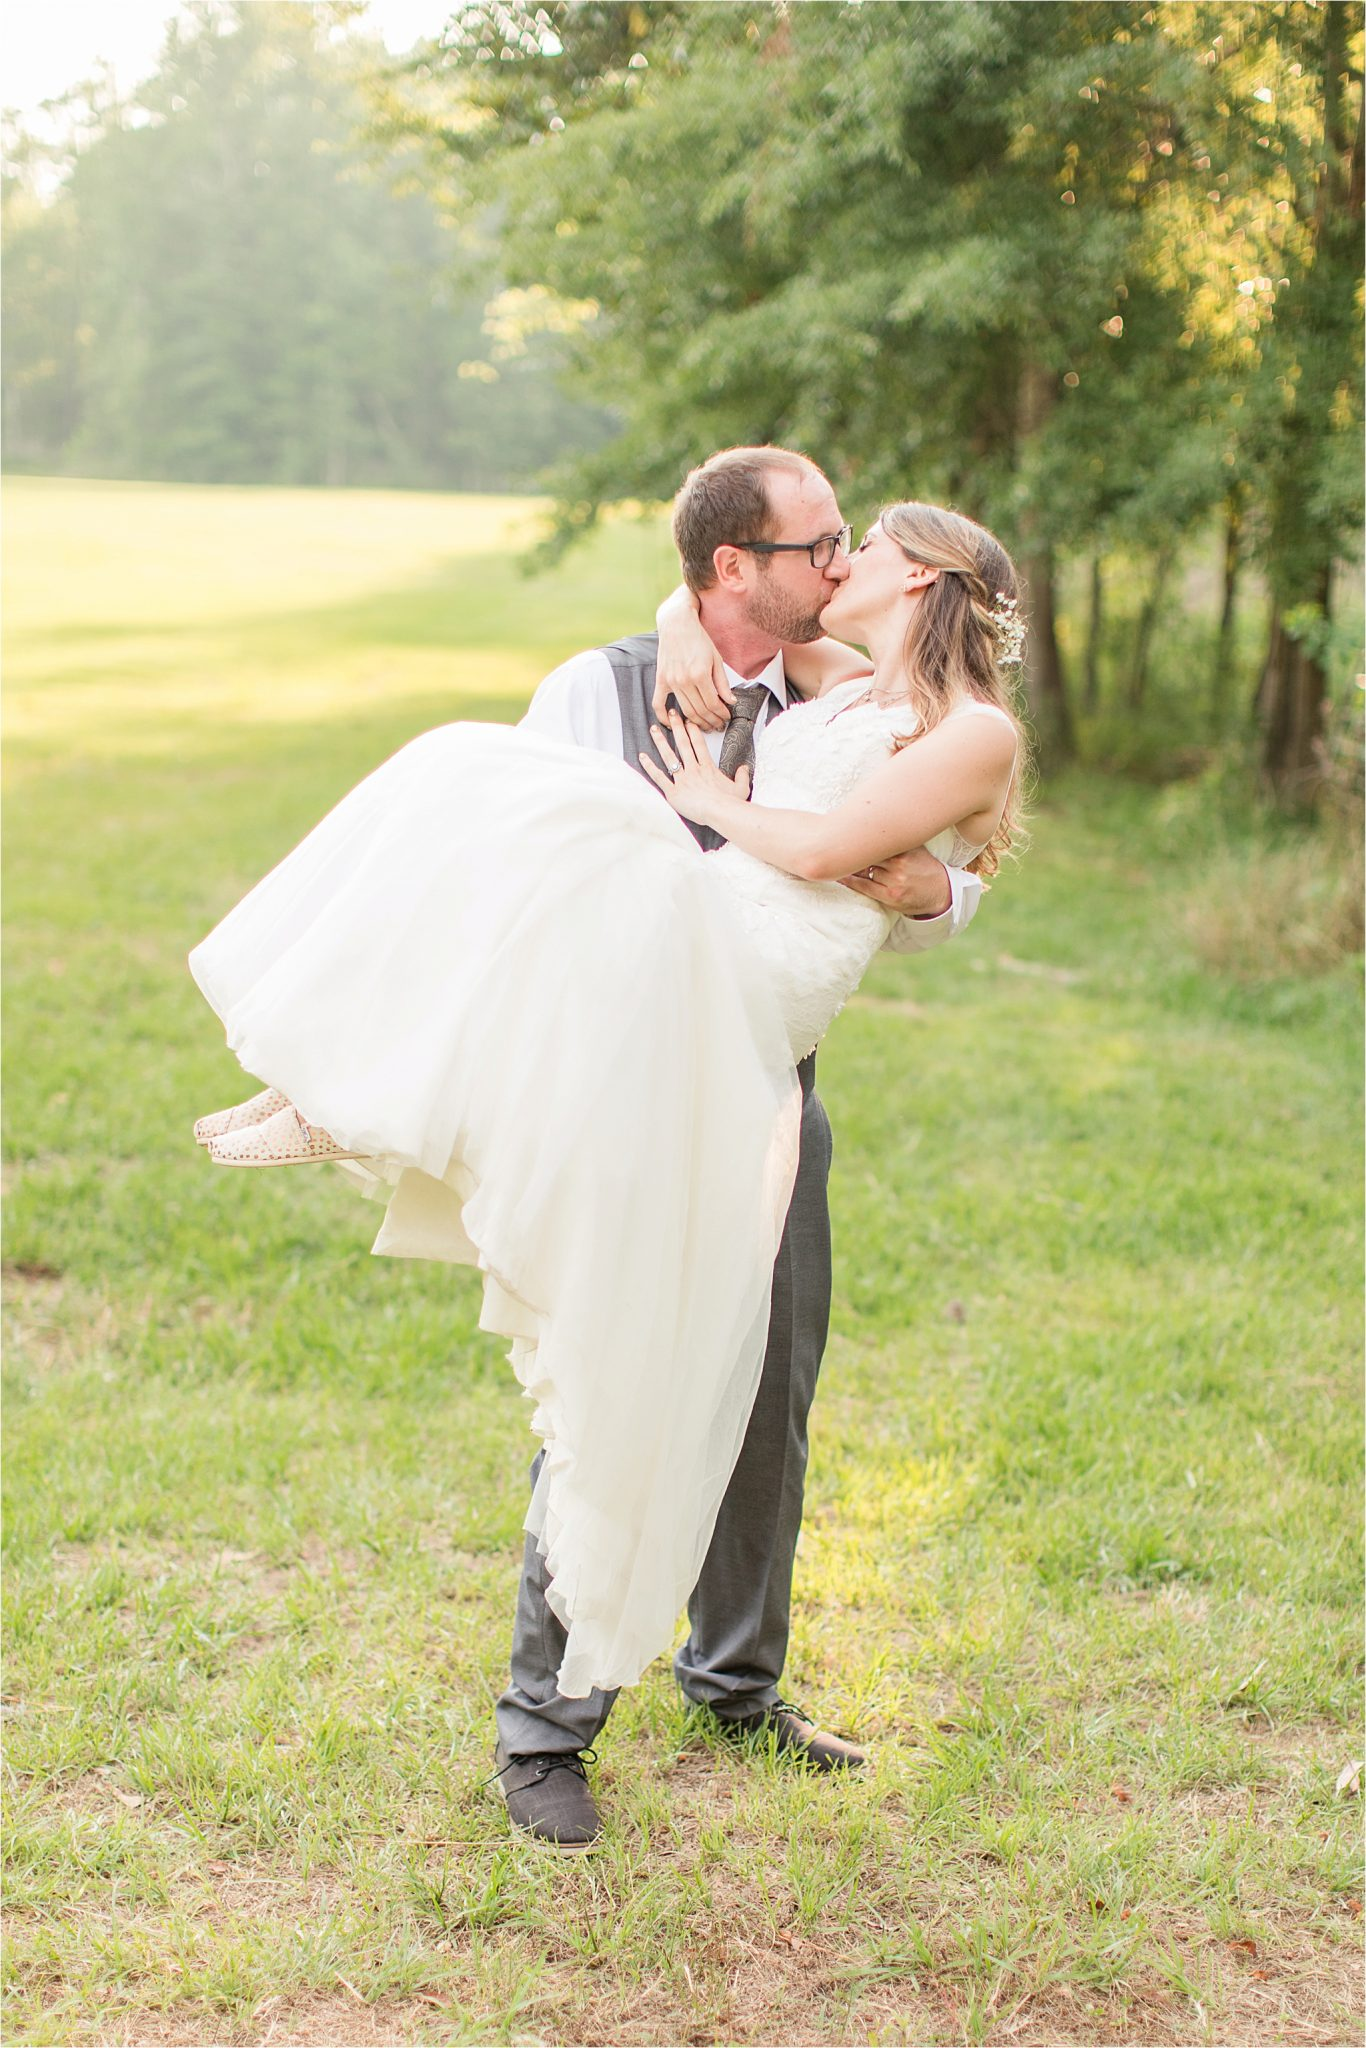 Backyard Wedding in the Country-greys-alabama weddings-wedding on a budget-Toms